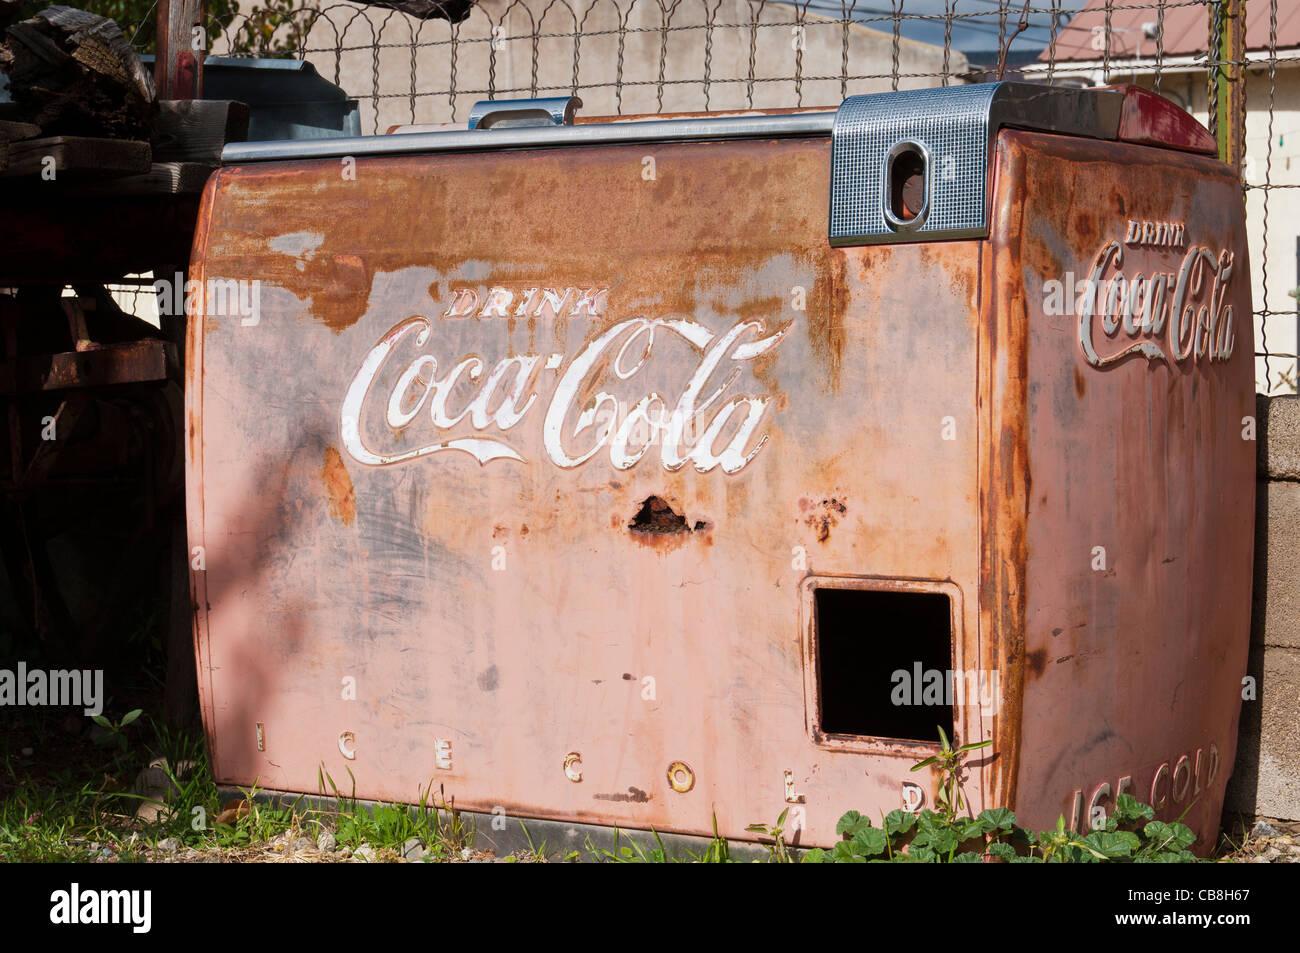 Coke machine, Vigil Store, El Portero Trading Post, Chimayo, New Mexico. - Stock Image